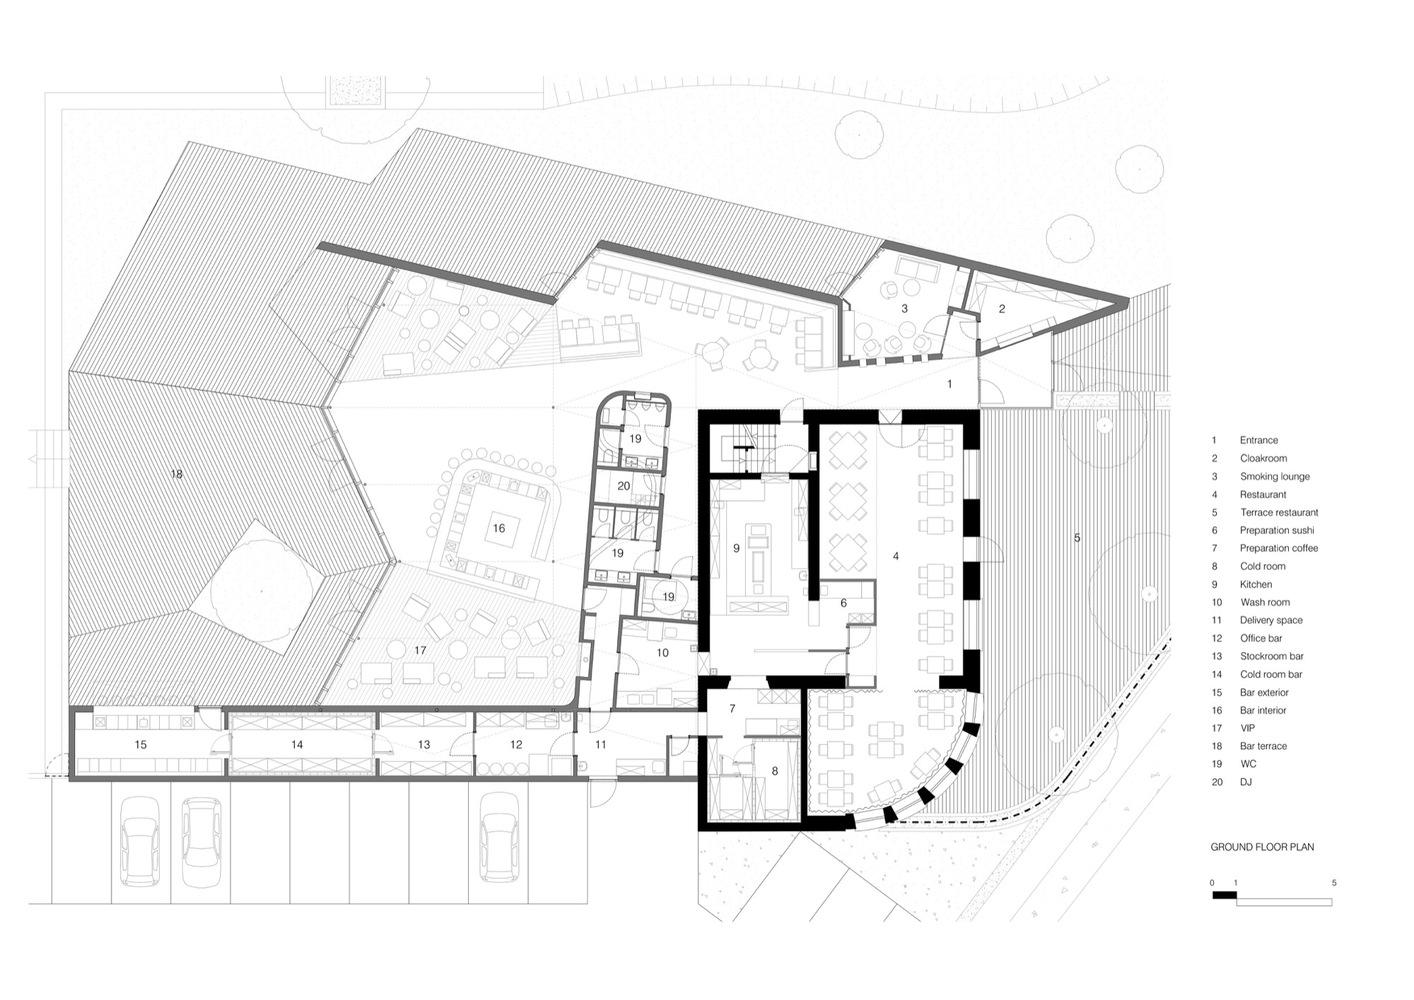 Galeria De Restaurante Boos Beach Club Metaform Architects 16